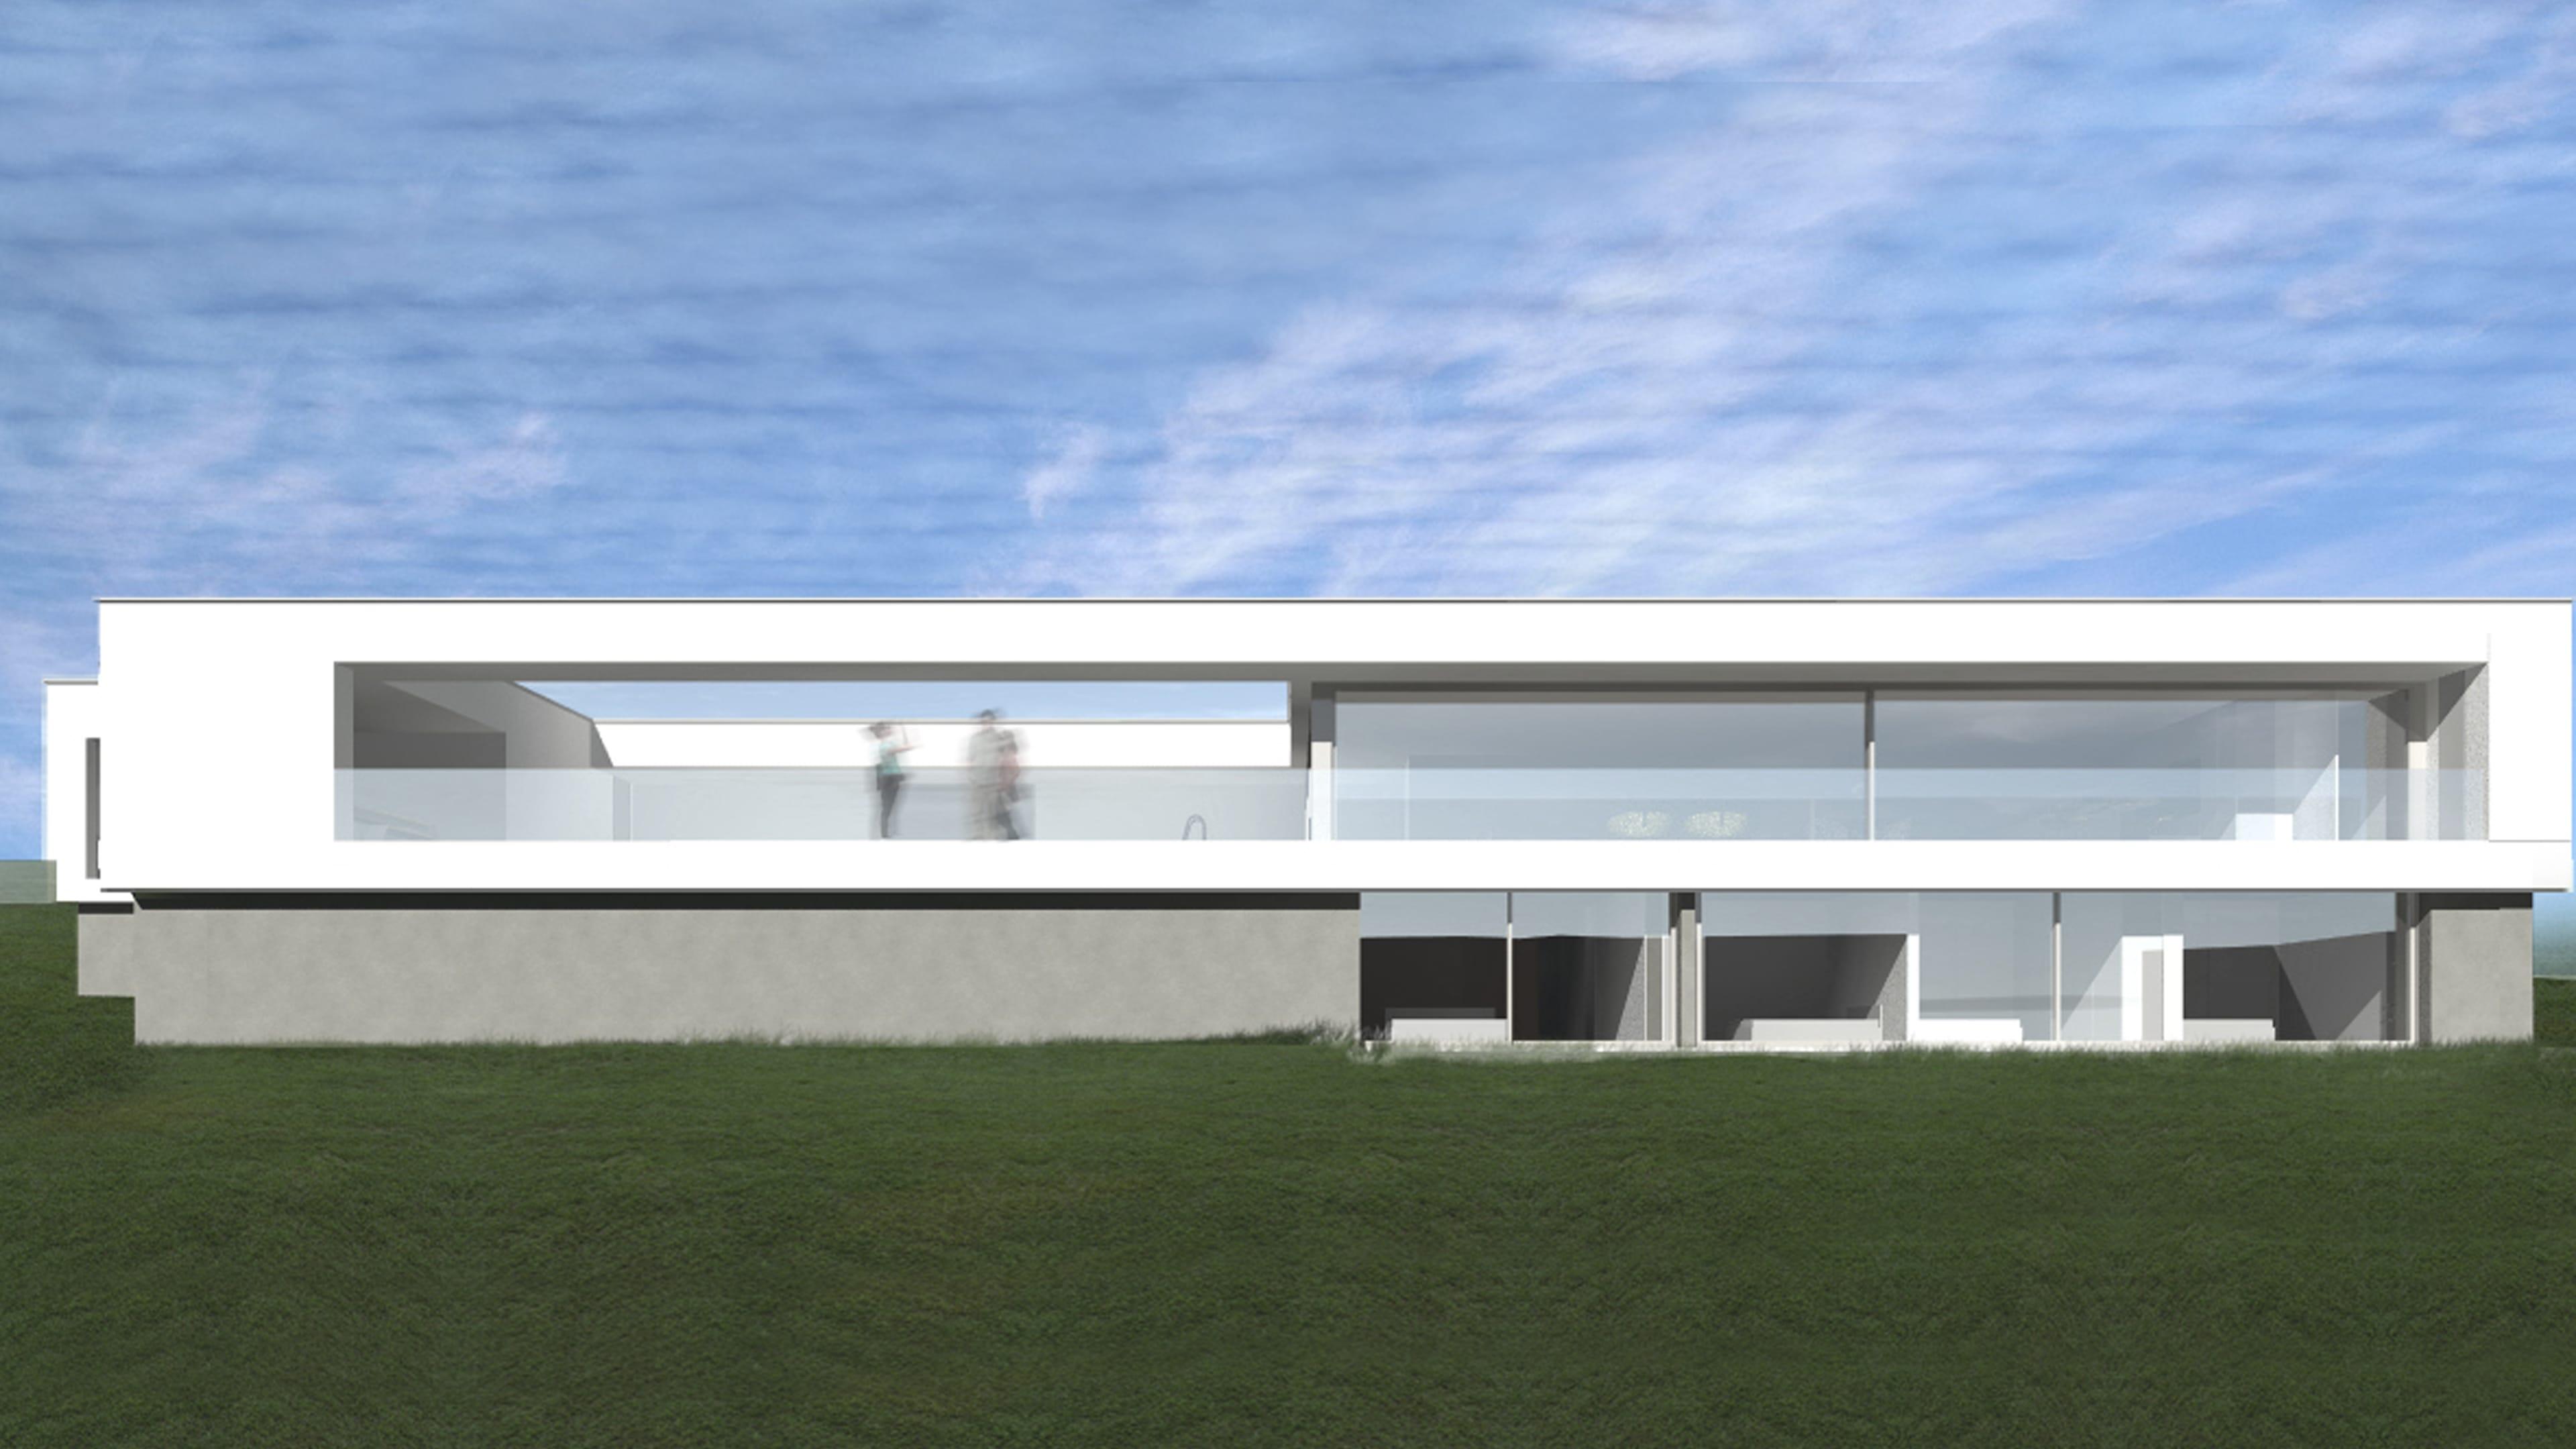 Villa, Luxe, Piscine, CFArchitectes, Luxembourg, Christophe Felten Architectes, CFA